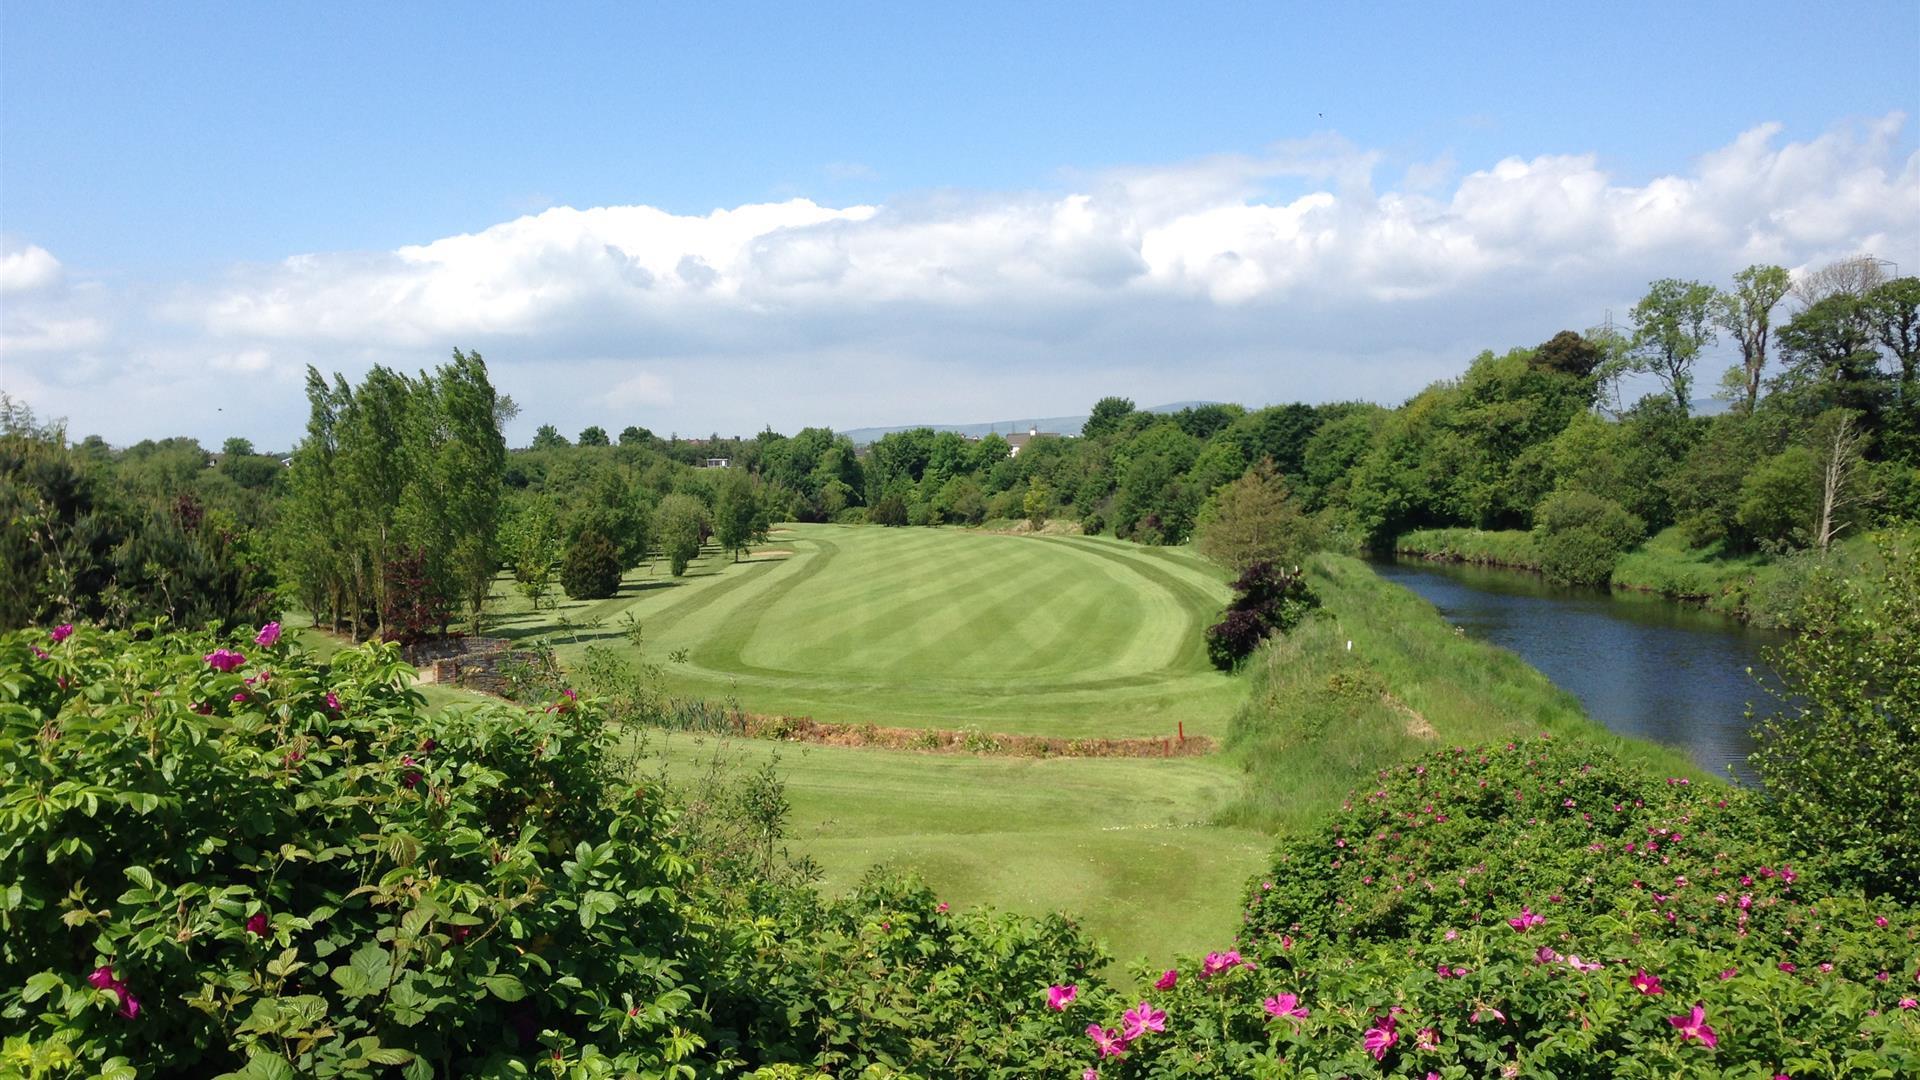 Faughan Valley Golf Club